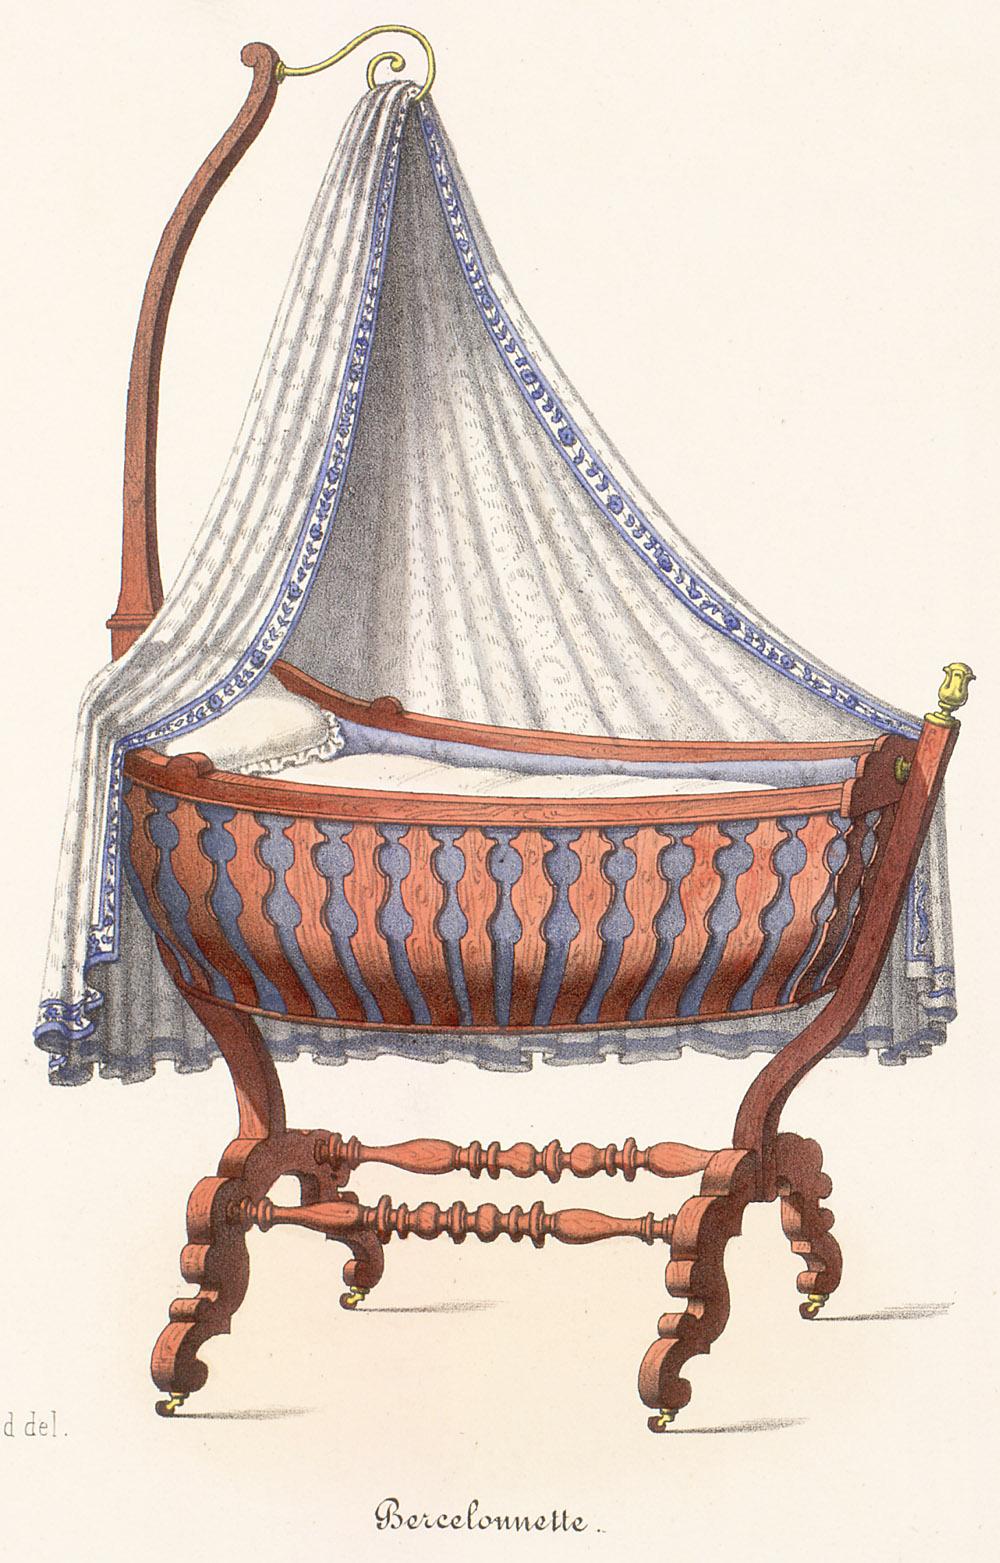 Beds (furniture),  Image number:SIL12-2-117b